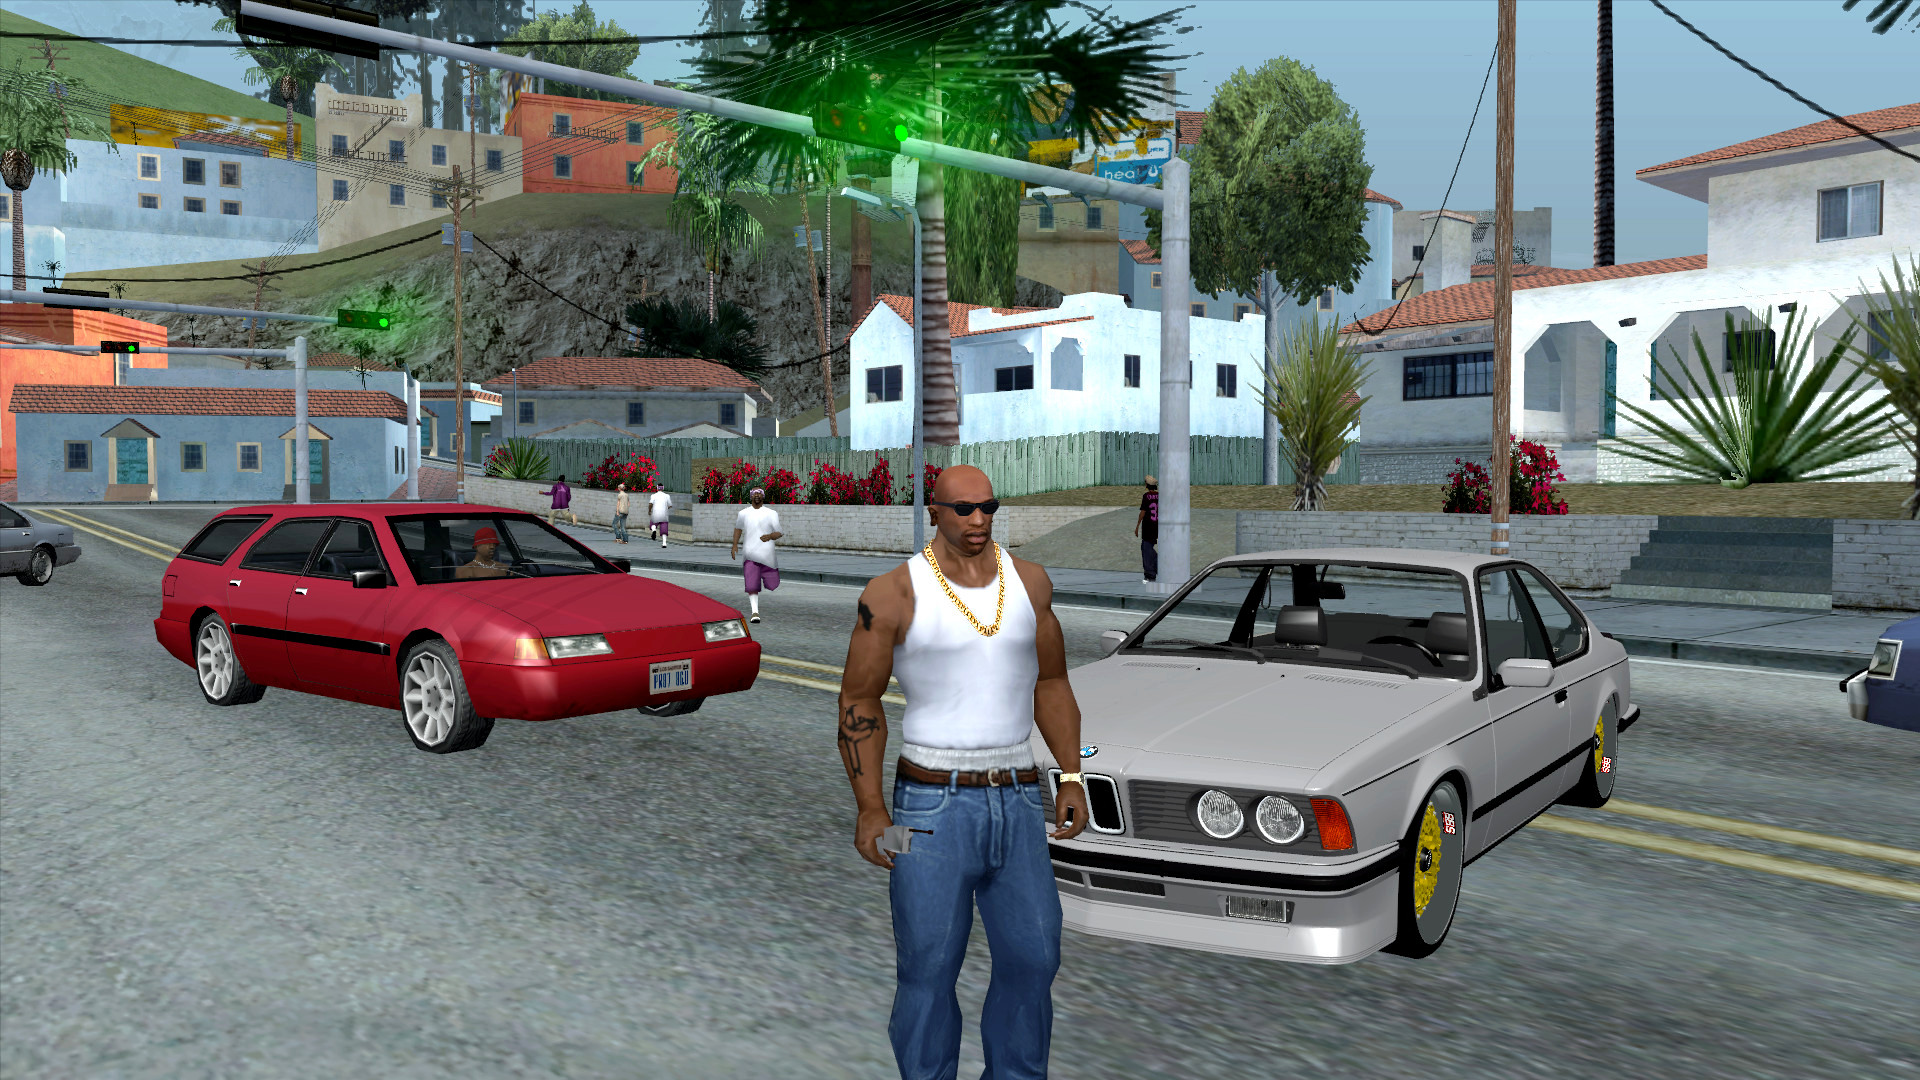 gta_sa 2016-05-11 22-21-10-49.jpg - Grand Theft Auto: San Andreas